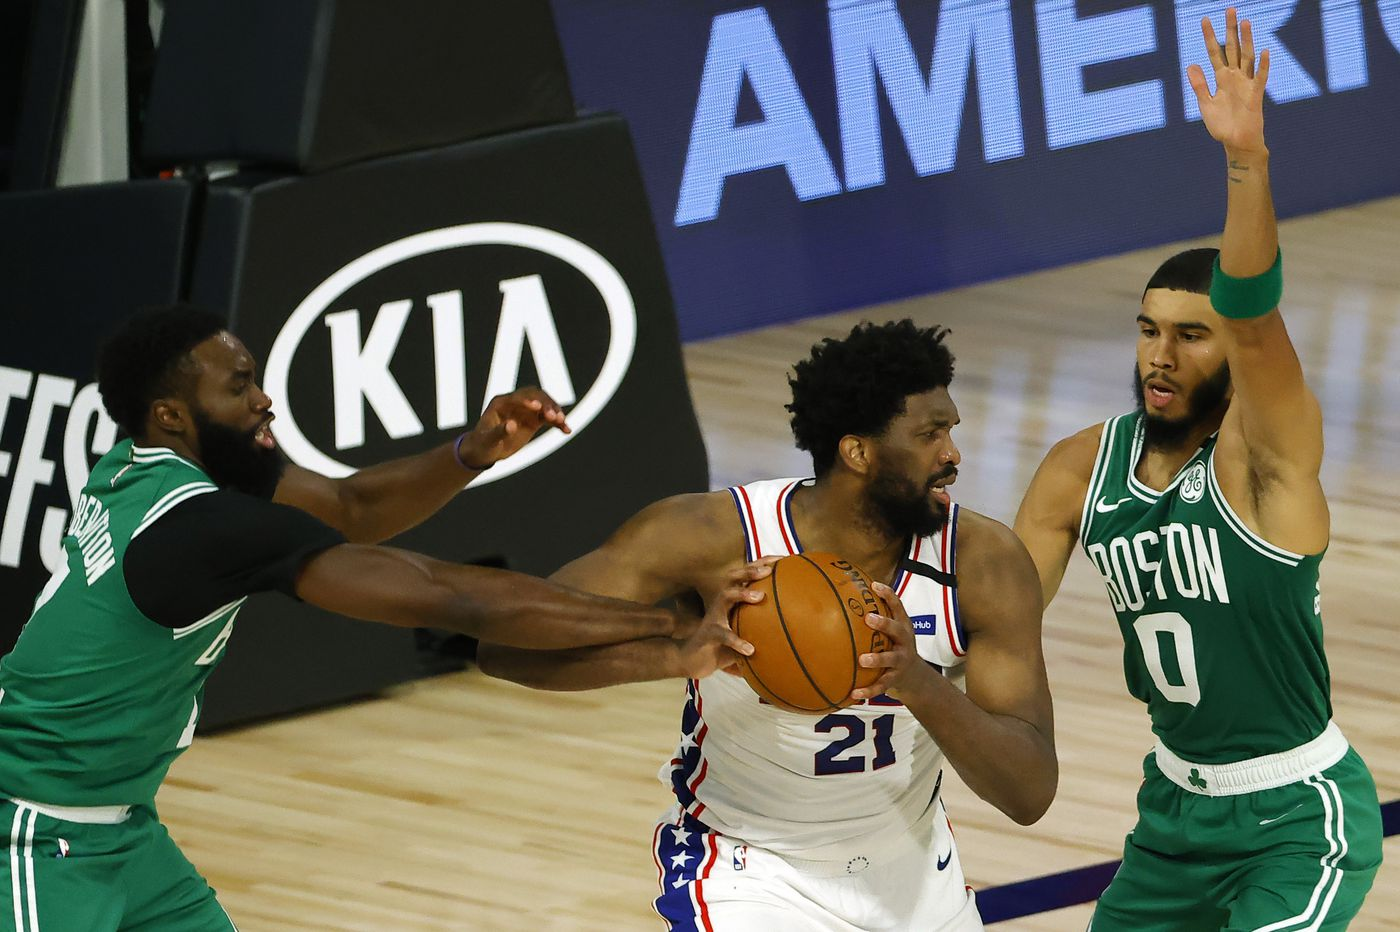 NBA preseason schedule released: Sixers draw games vs. Celtics, Pacers